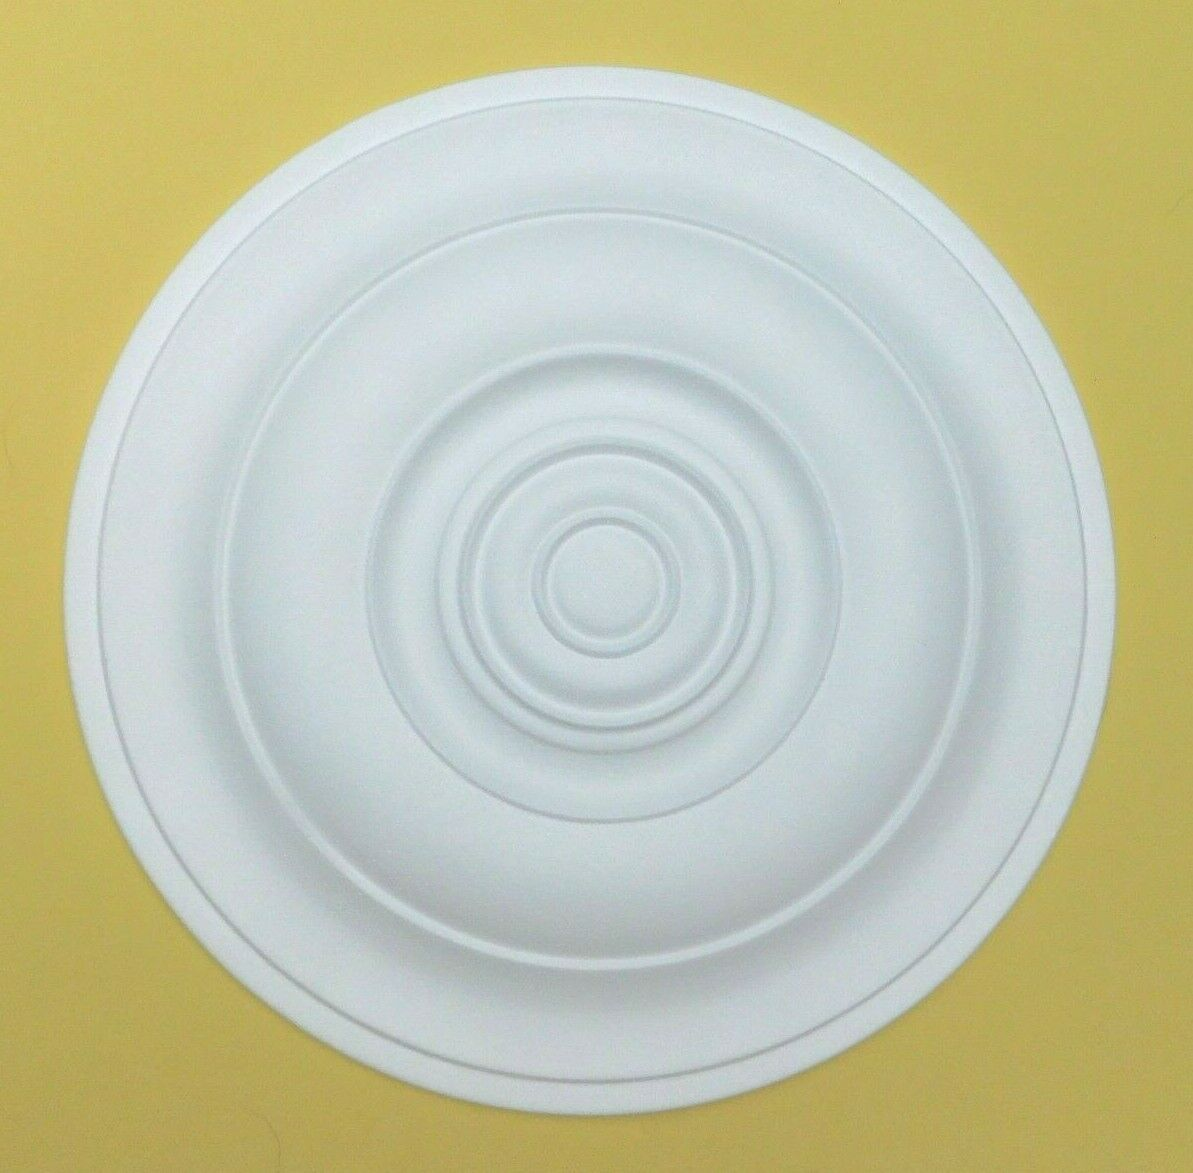 Ceiling Rose Size 40CM - Ceiling Rose Polystyrene Easy Fit - ' ELEGANCE'